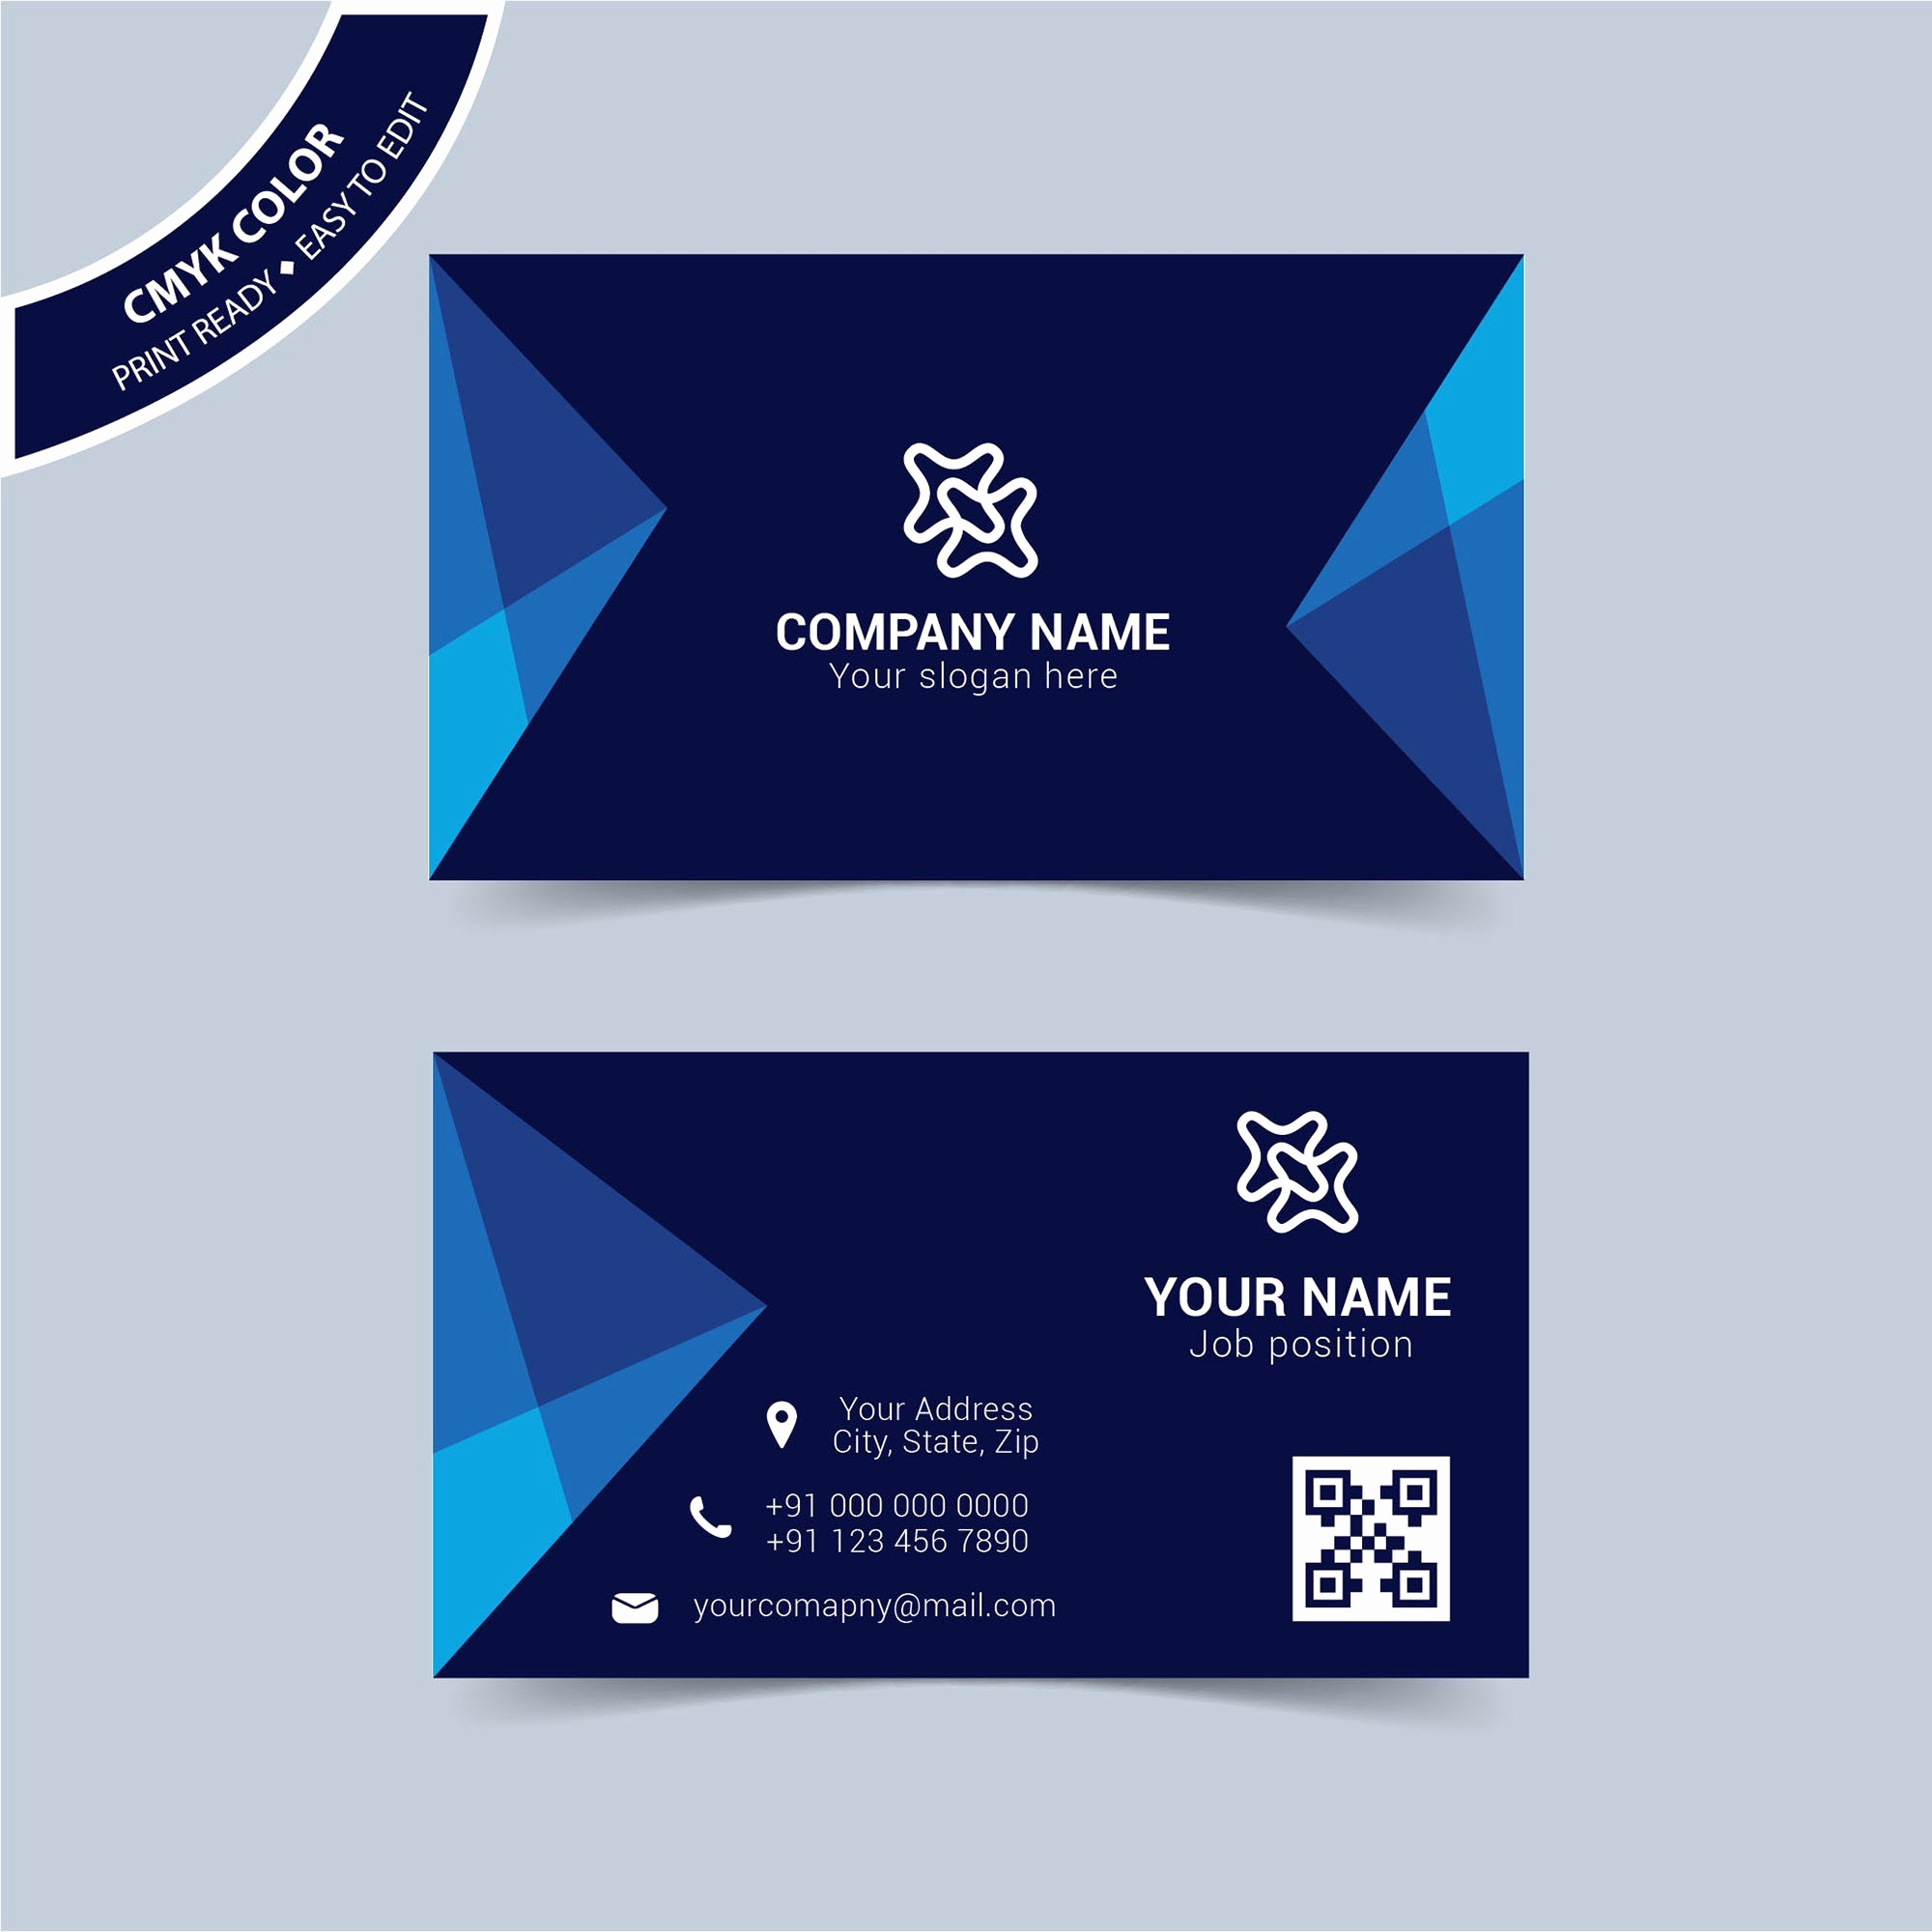 Business Card Illustrator Template Fresh Business Card Template Illustrator Free Download – Modern